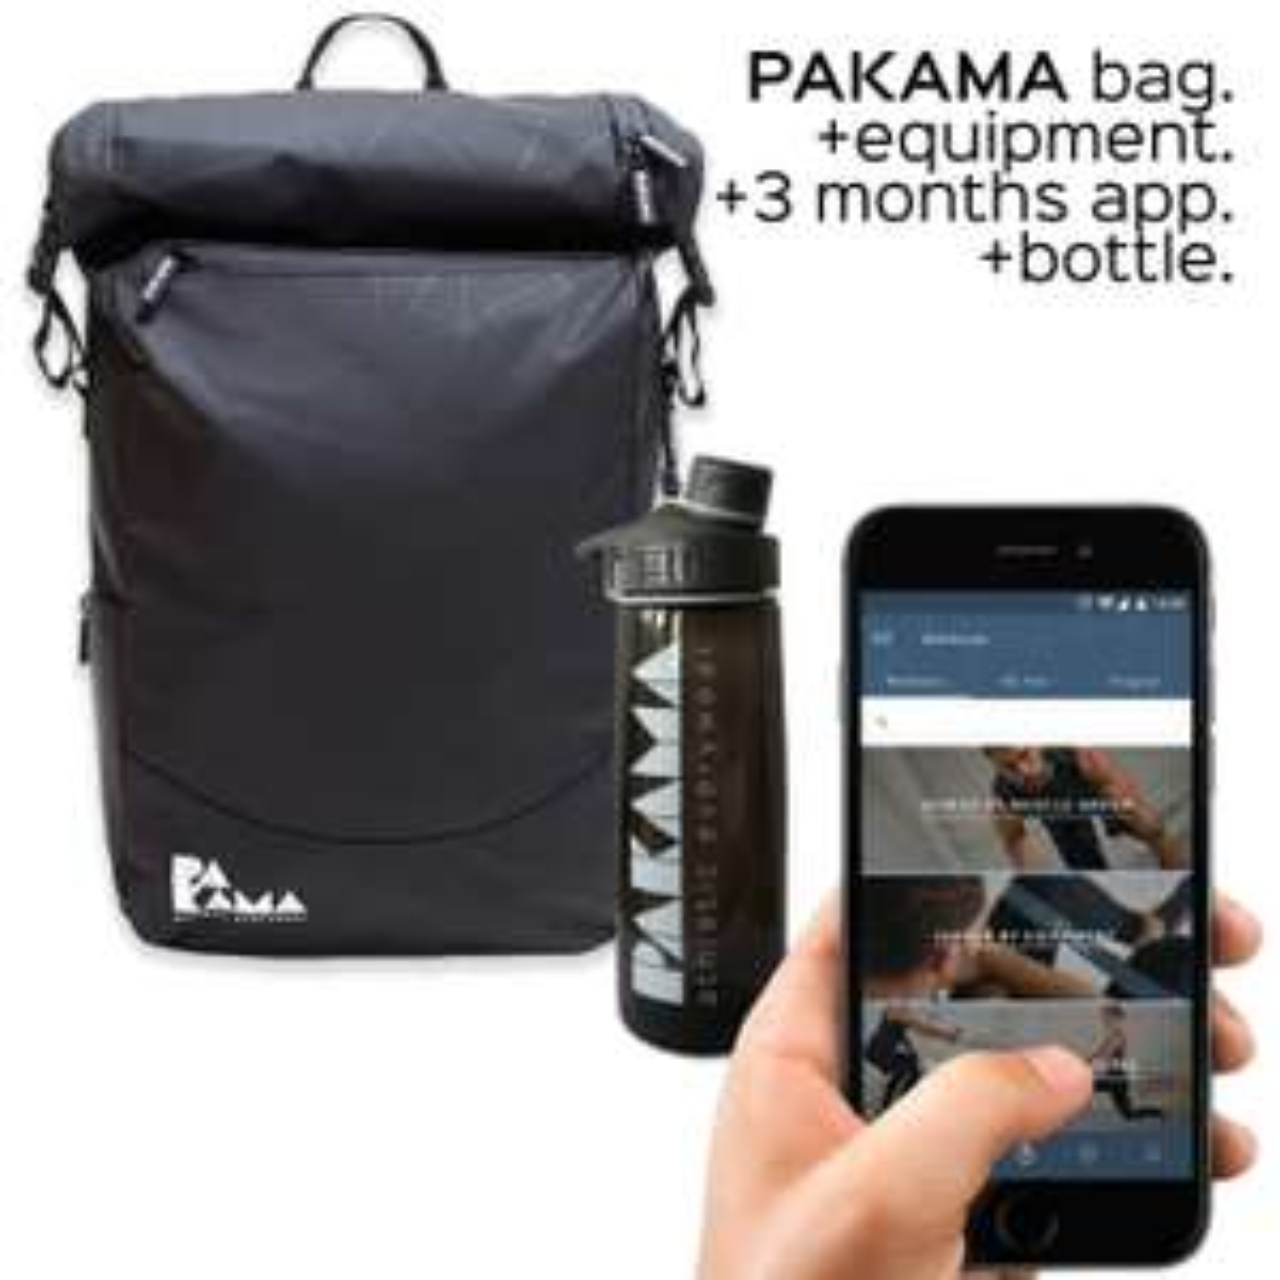 80€ auf den PAKAMA Sportsbag .Rucksack + Fitness-Tools + App im Black Weekend Special